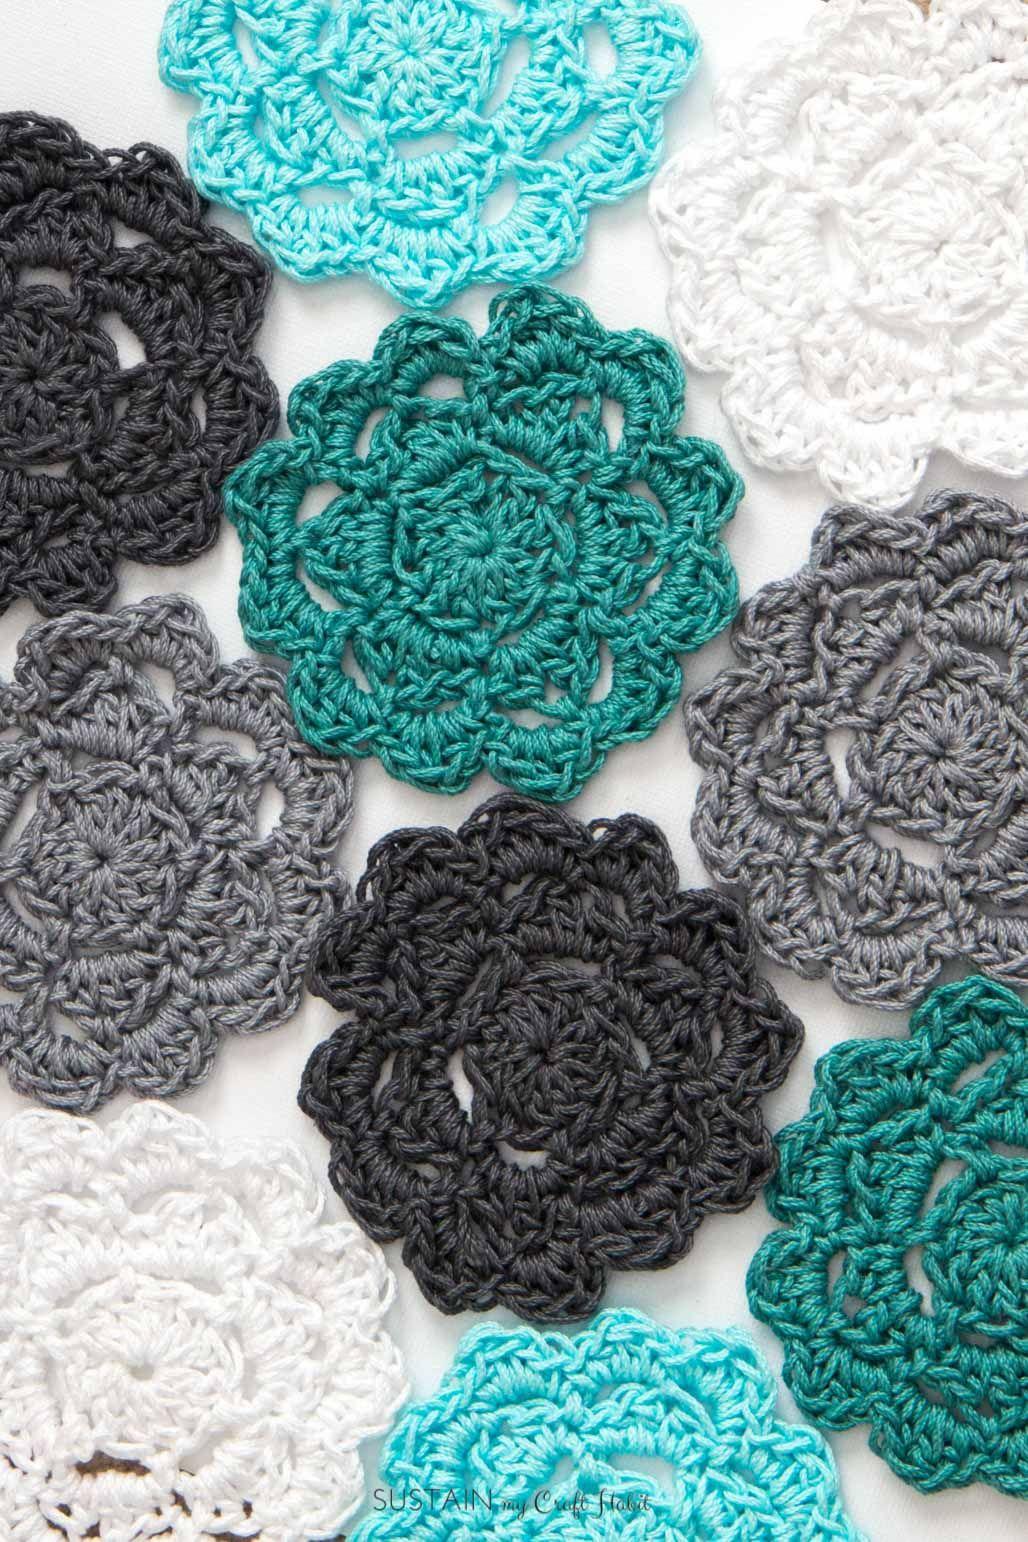 Easy Crochet Coasters Pattern for Beginners | Crochet coaster ...